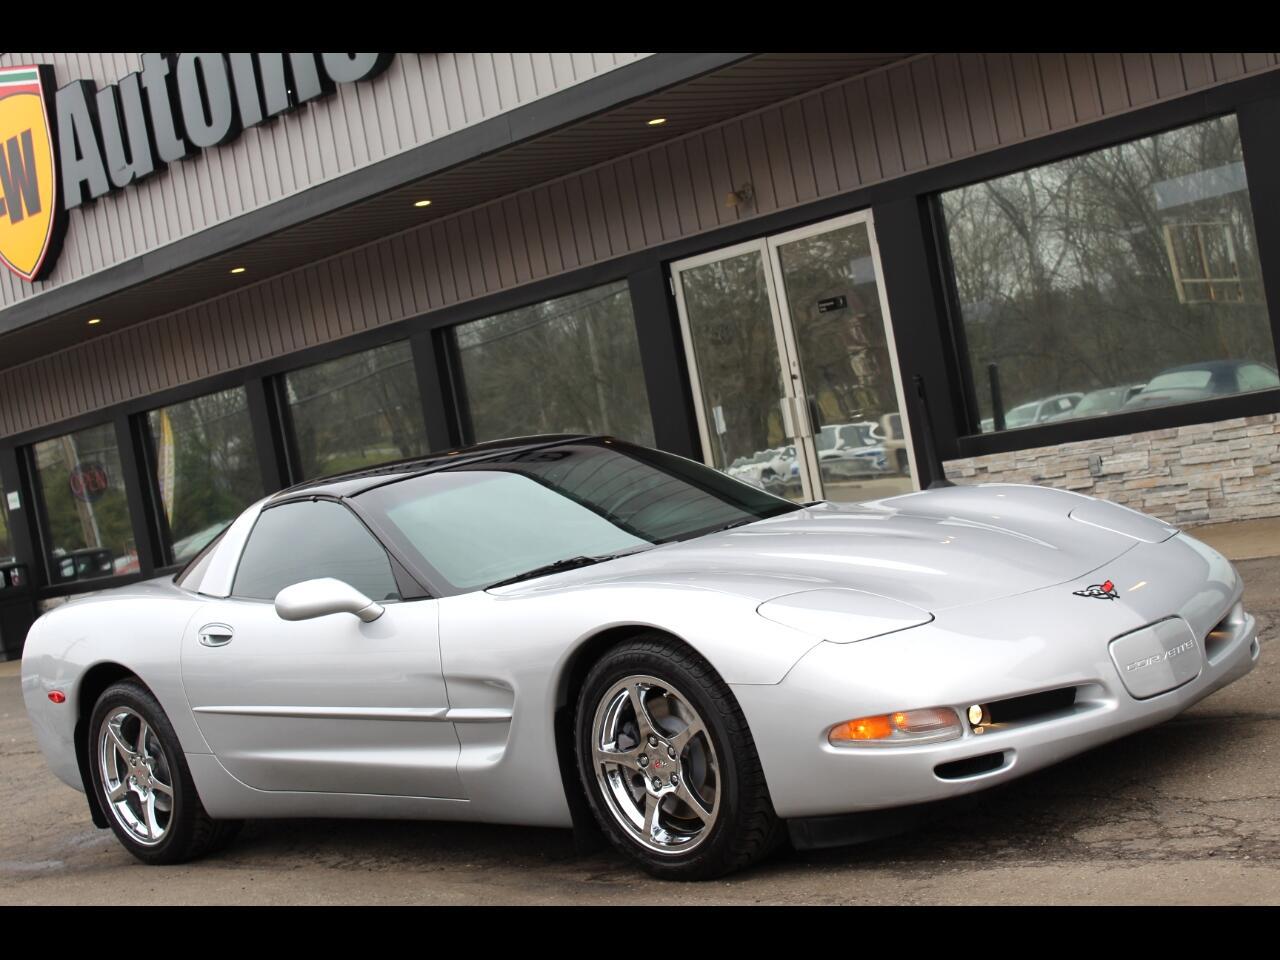 Chevrolet Corvette 2dr Cpe 1999